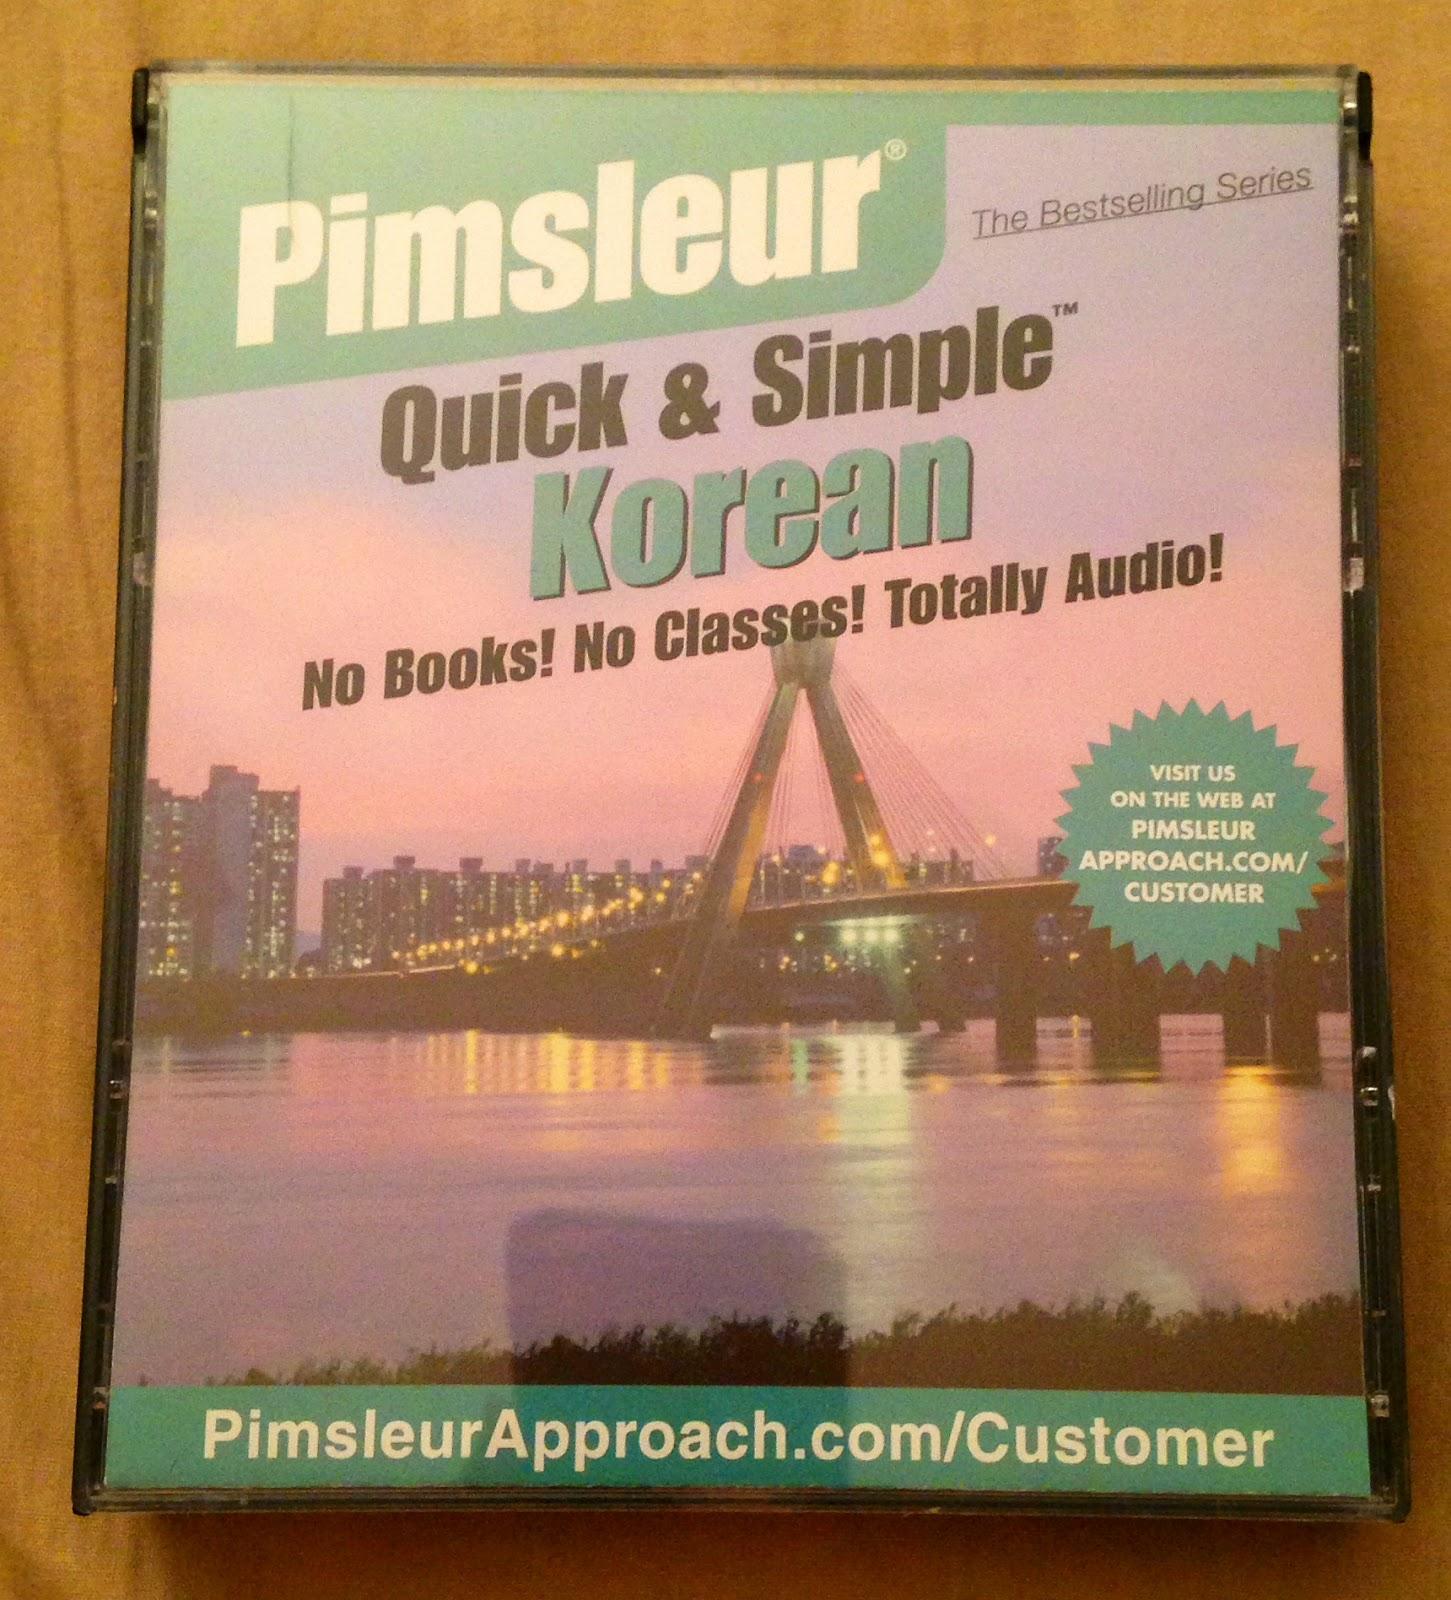 Korean Q & S Free Audio Download (Pimsleur) ~Share Please